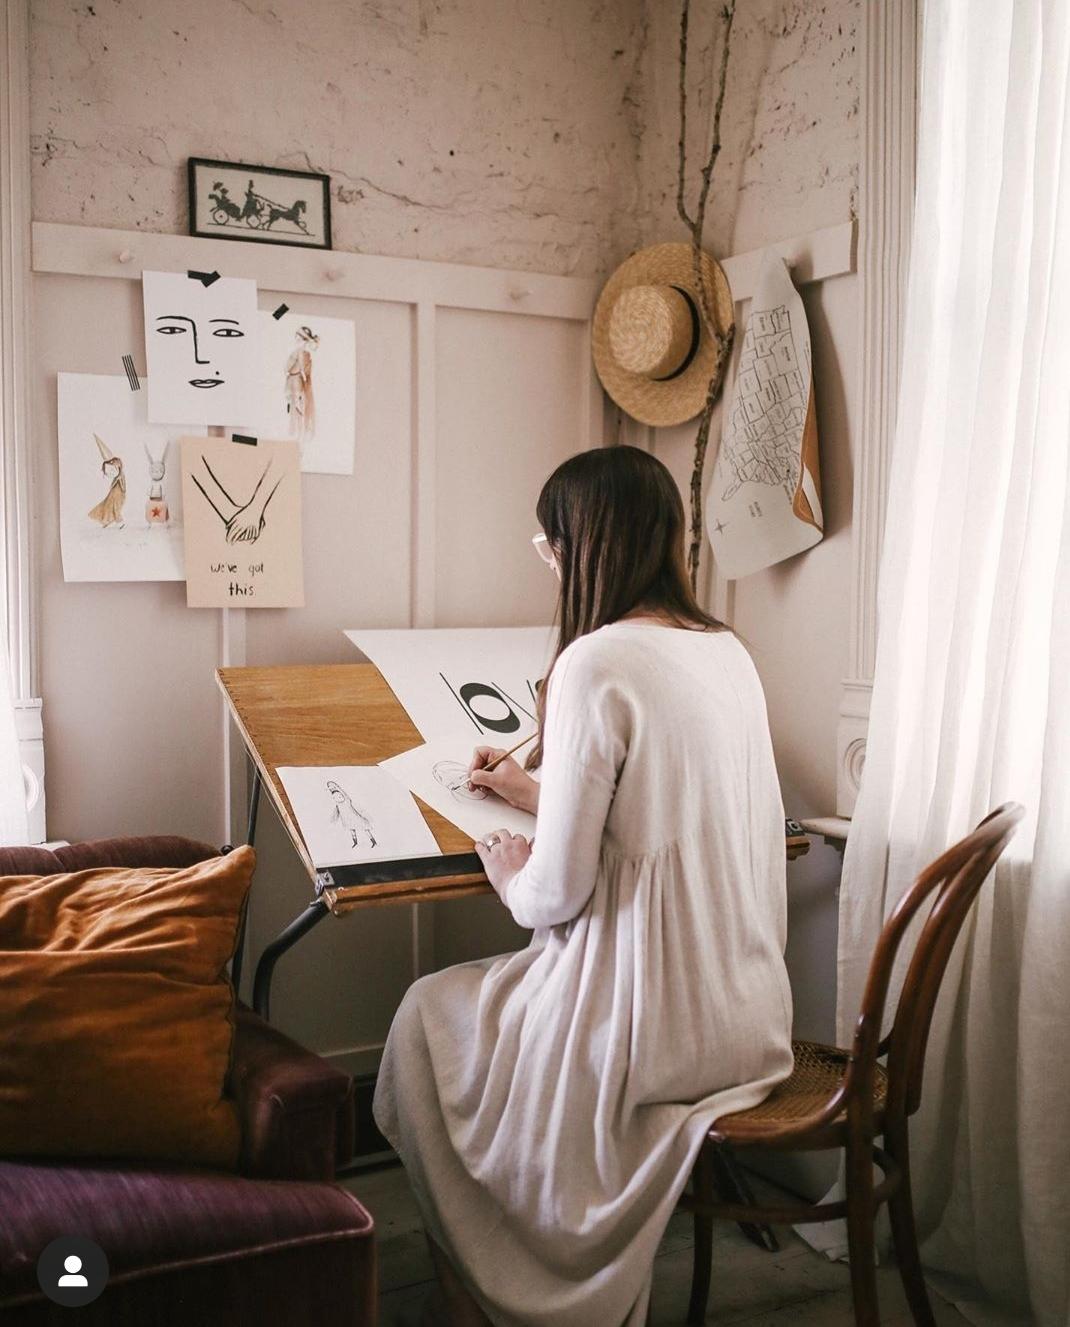 La artista Merrilee Liddiard trabajando en su estudio.